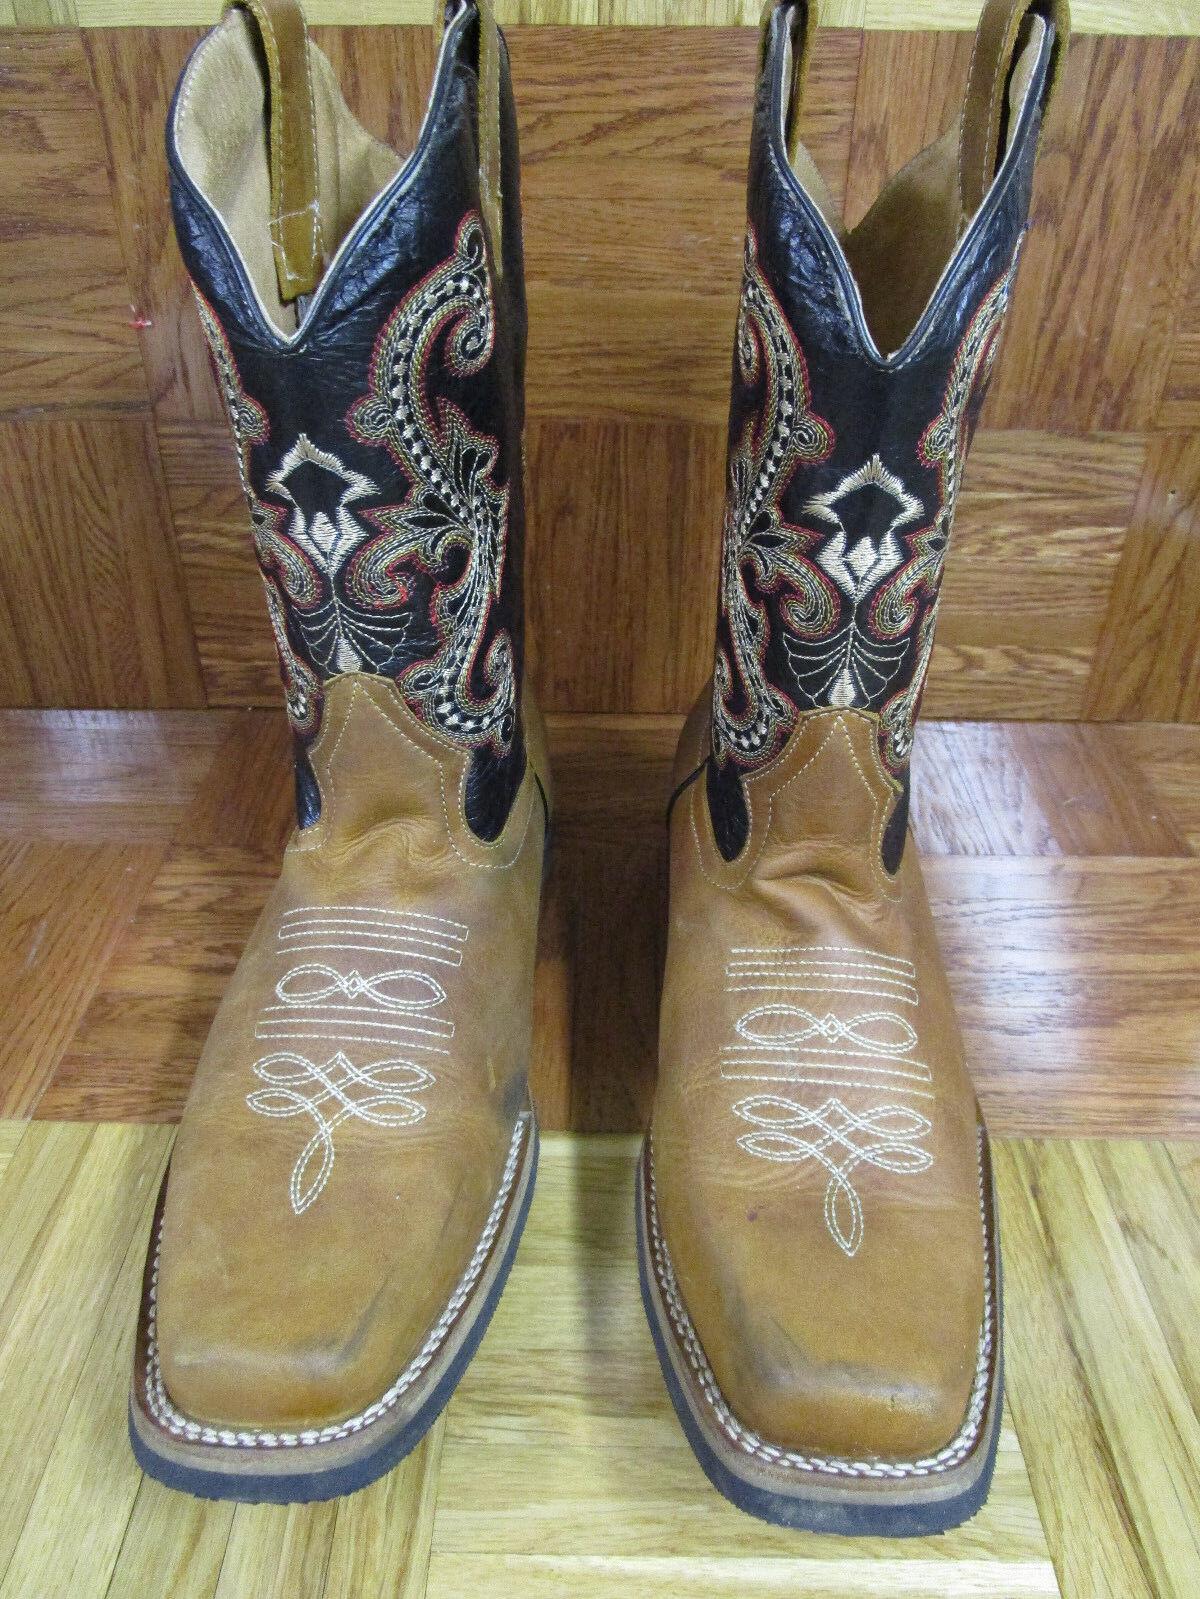 CALIFORNIA DE MABI Cowboy Western Rodeo Mint Condition Boots Size 12M